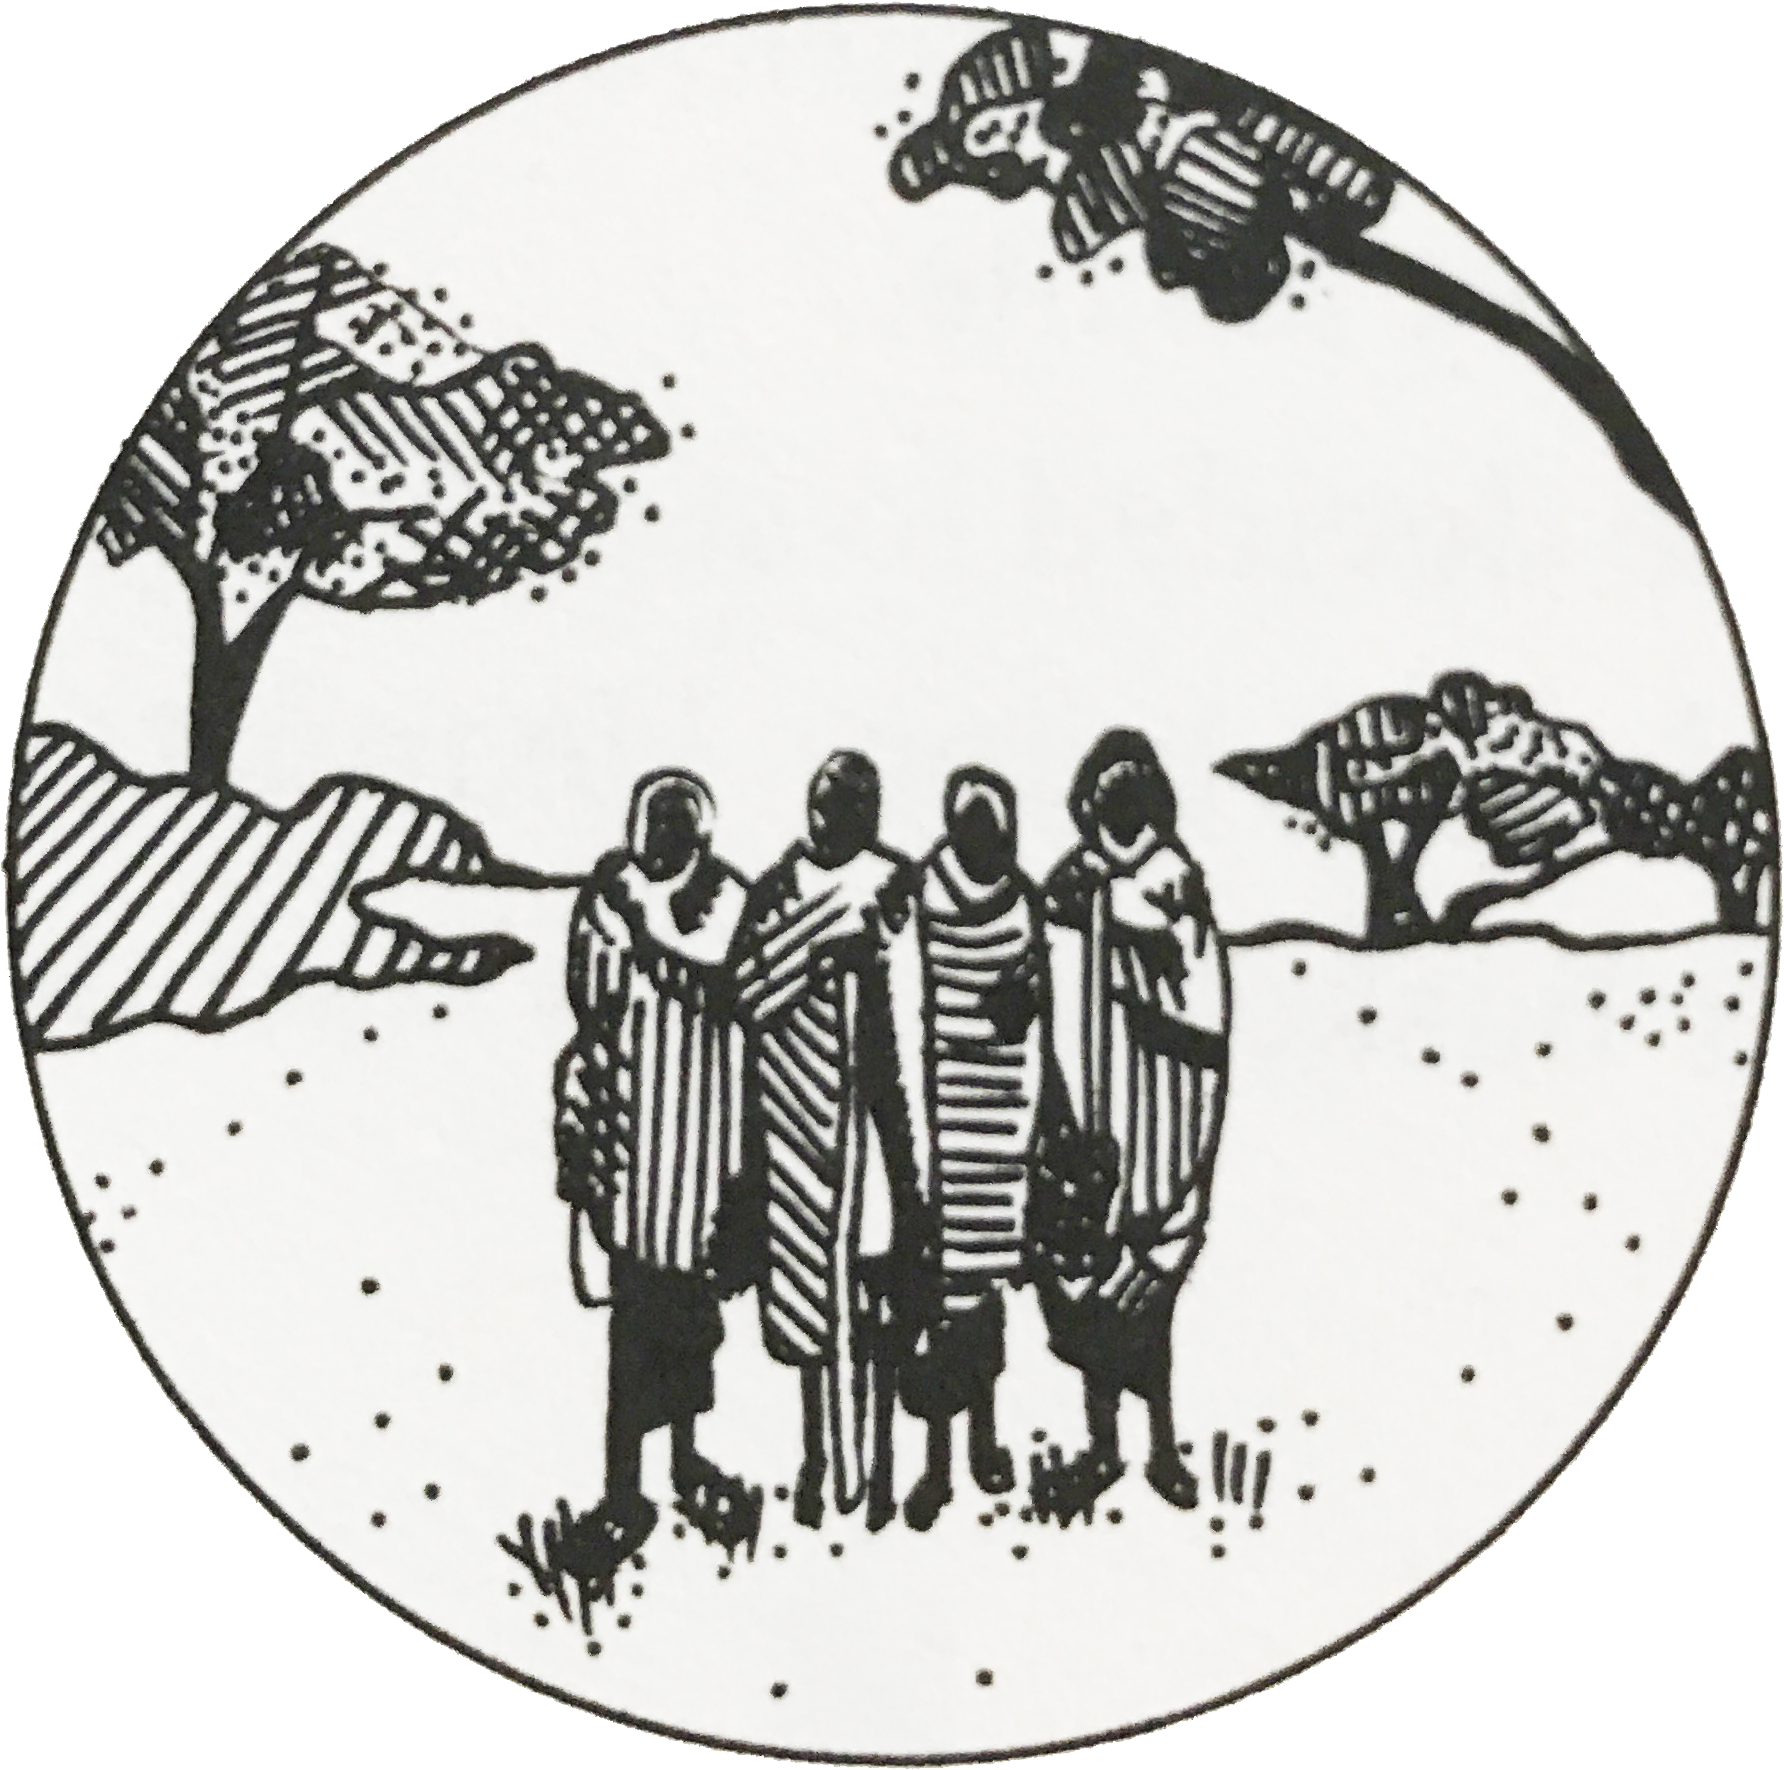 Nditai's Initiation